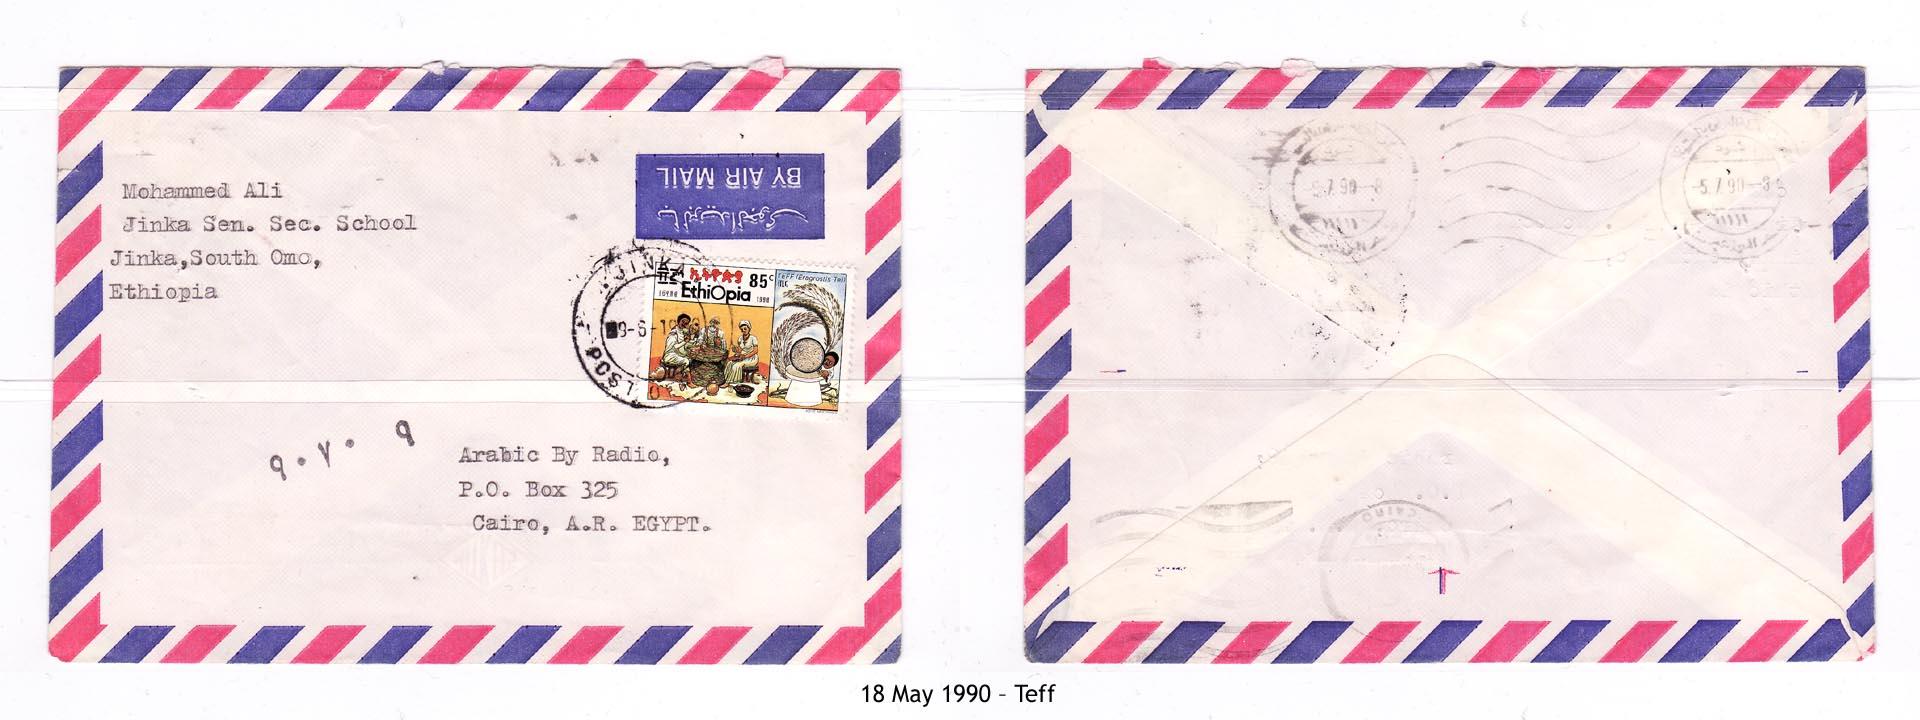 19900518 – Teff